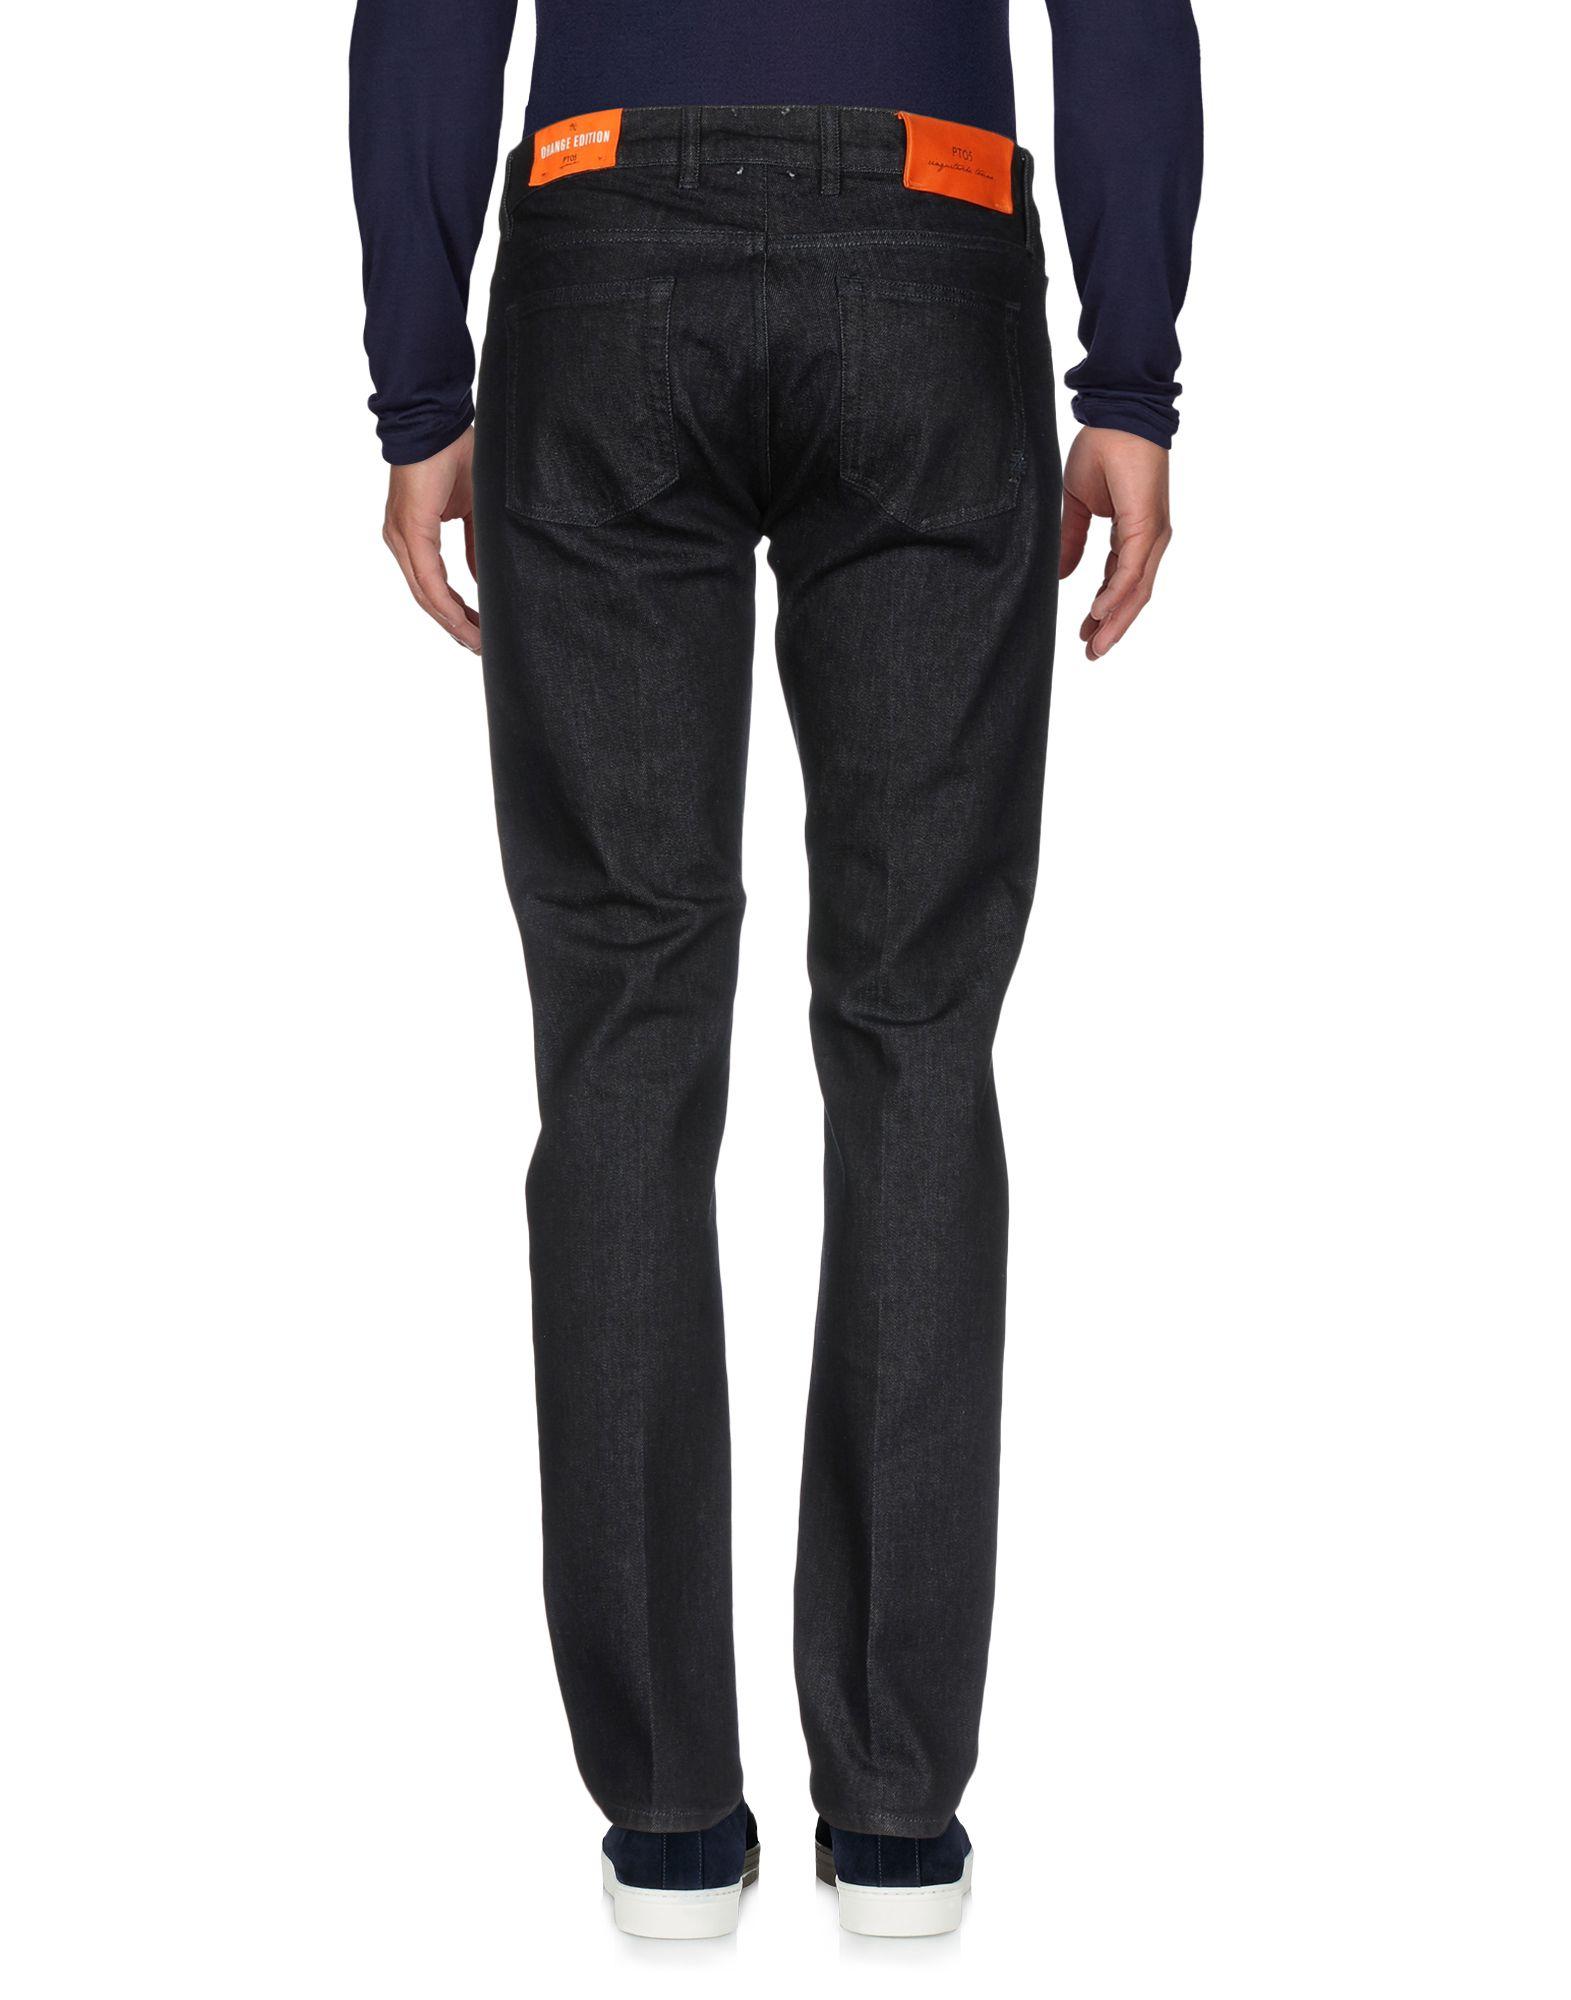 Pantaloni Jeans Pt05 Uomo Uomo Pt05 - 42672708LU 9a27f2